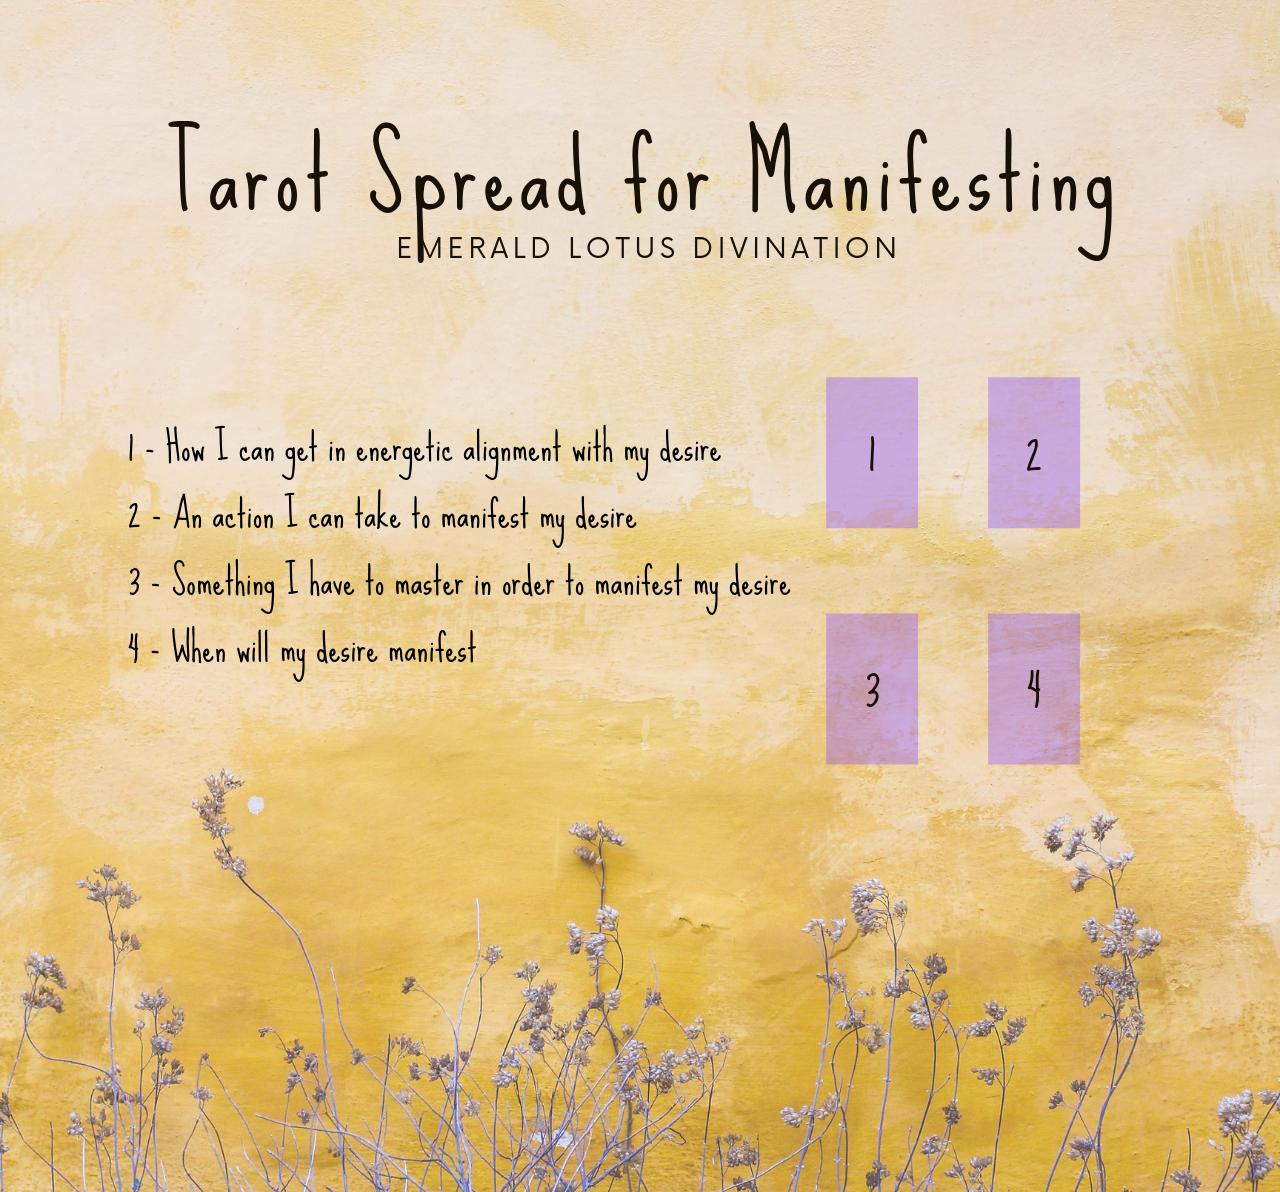 Manifesting-Tarot-Spread-Emerald-Lotus.png